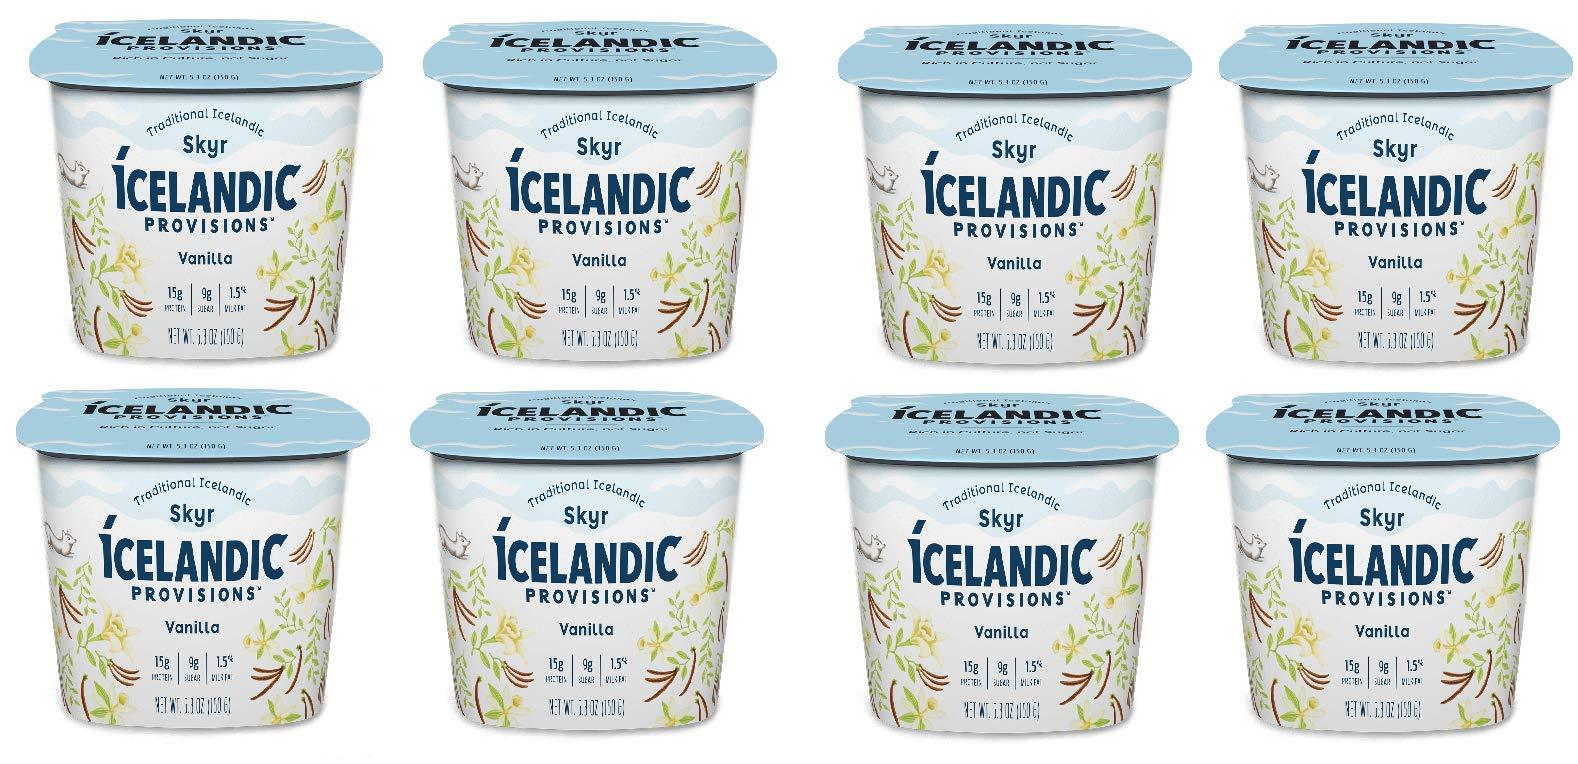 Icelandic Provisions, Skyr Vanilla Yogurt (Pack of 8)